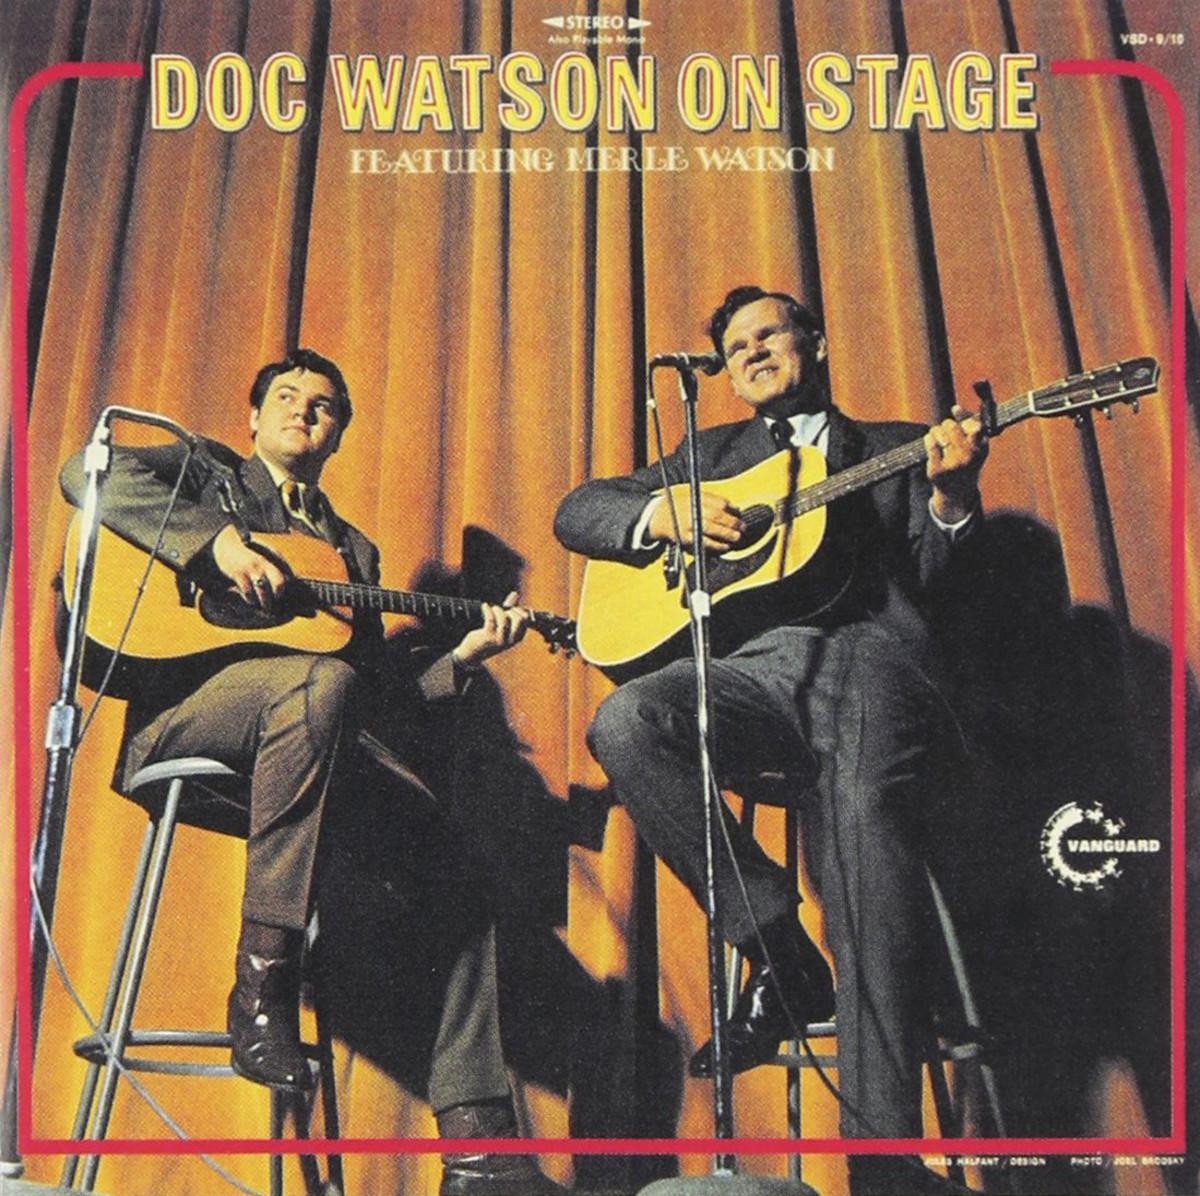 Doc Watson, On Stage Featuring Merle Watson